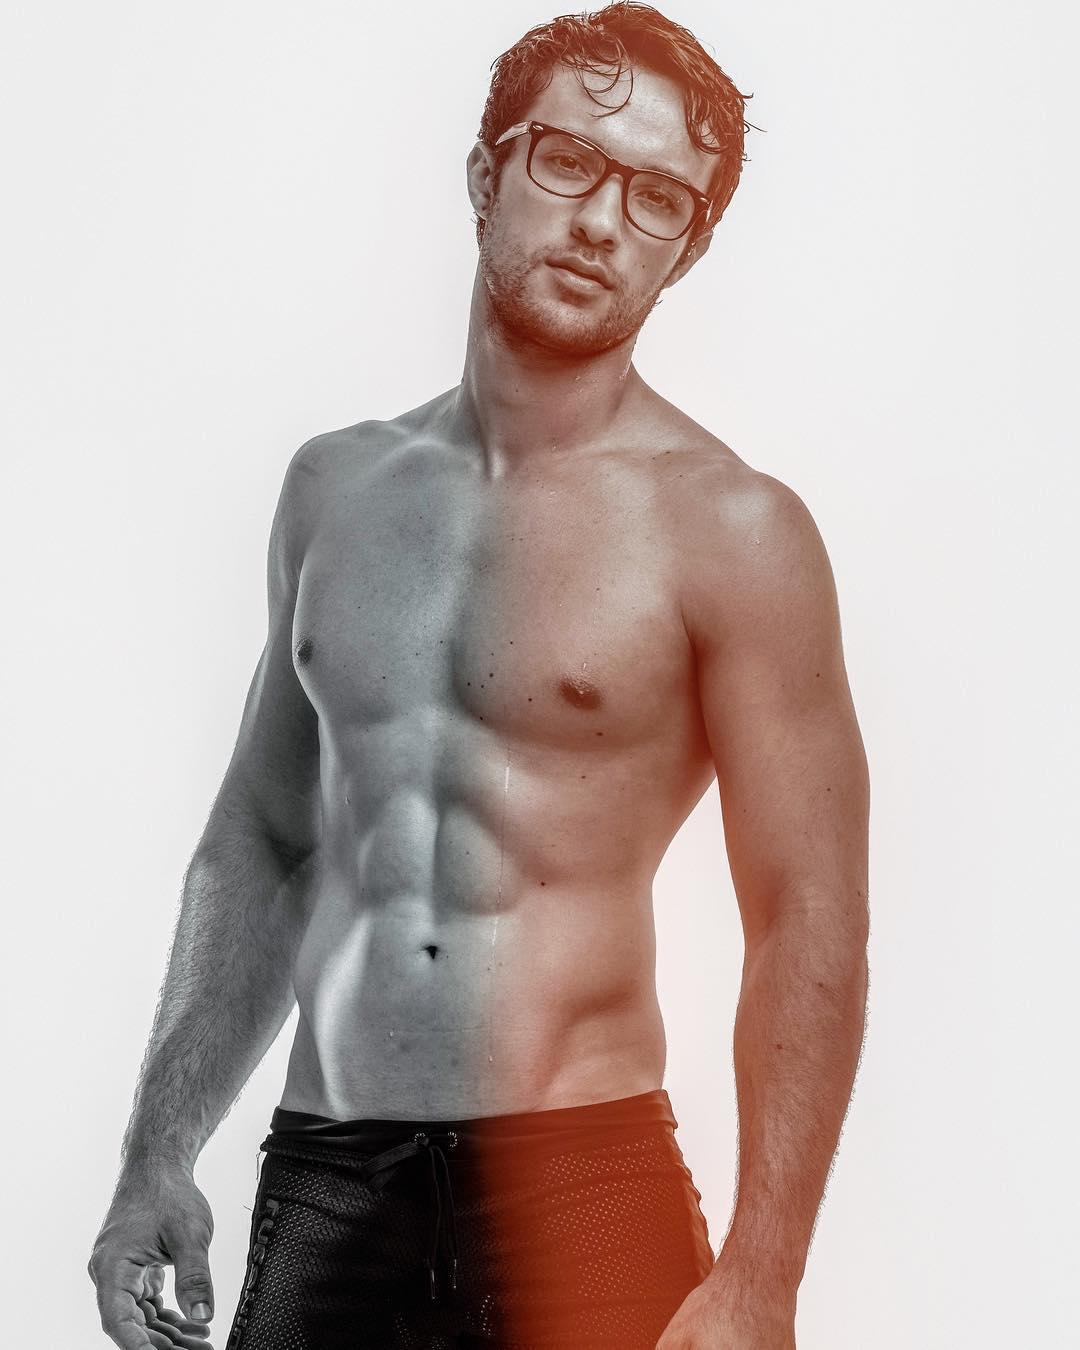 Carlos Magno - @carlosmagnoator - 171k de seguidores - Lifestyle/Beleza/Fitness